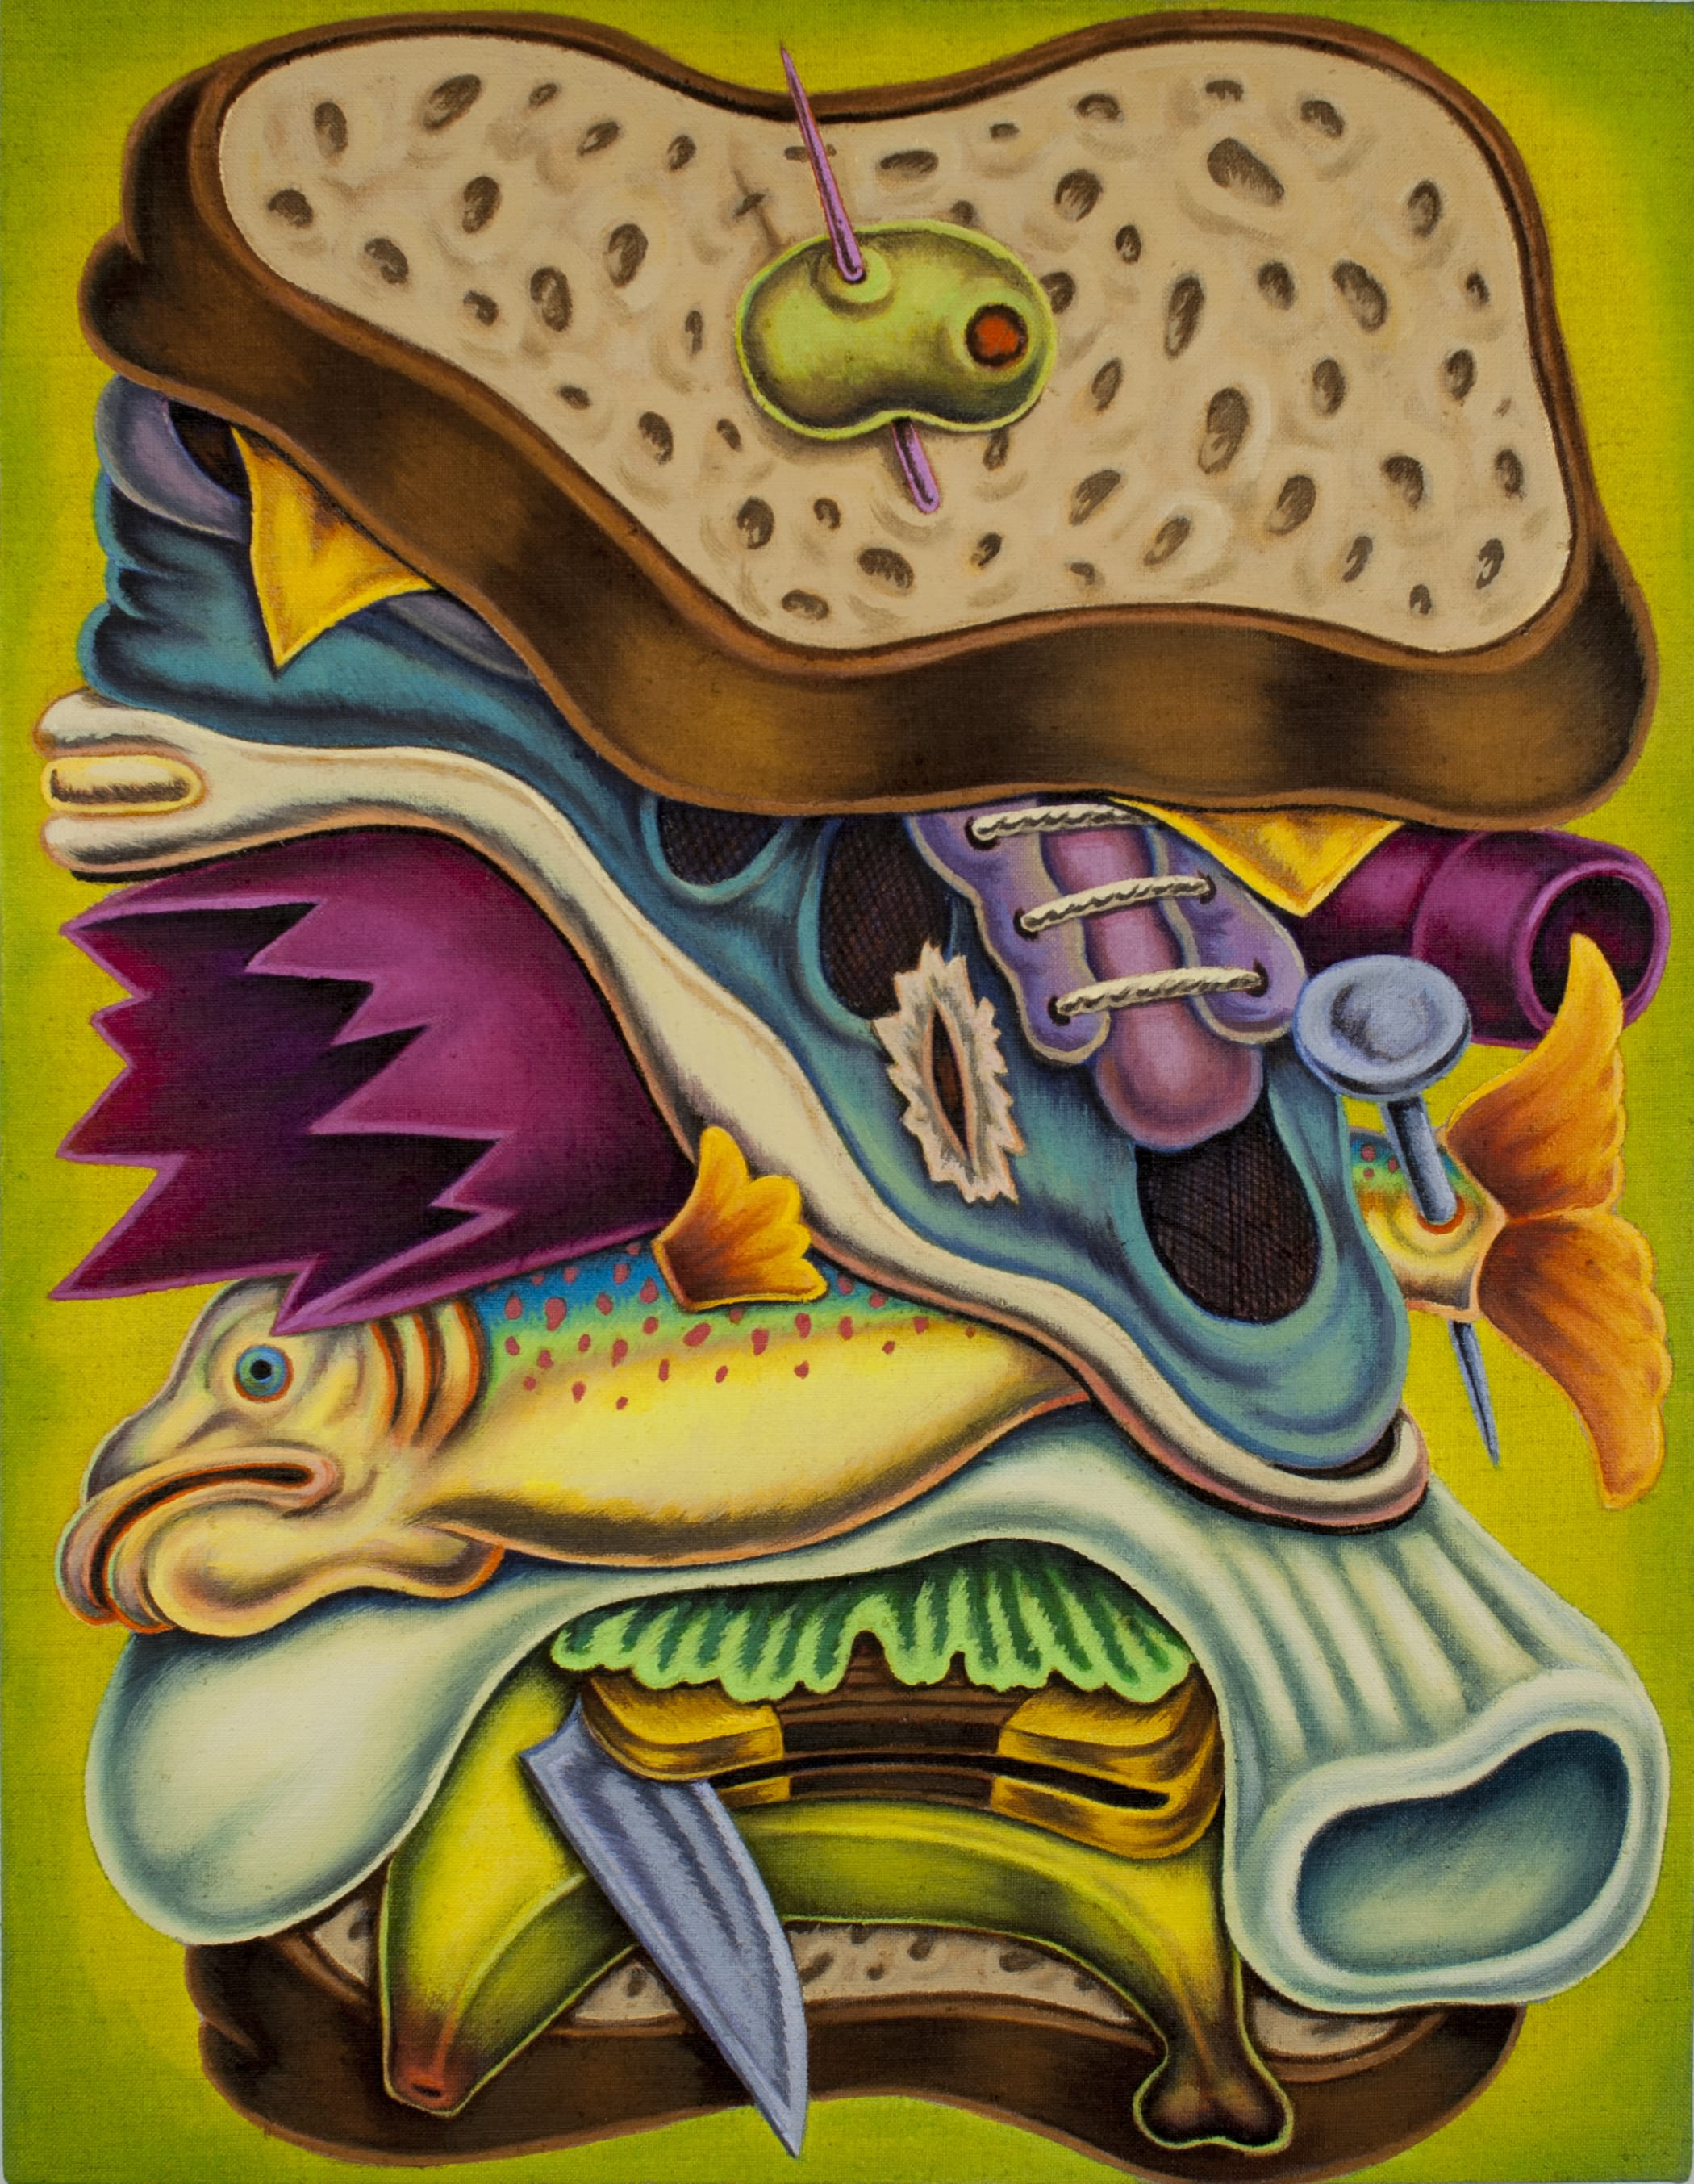 Pedro Pedro, Enjoy Every Sandwich, 2019